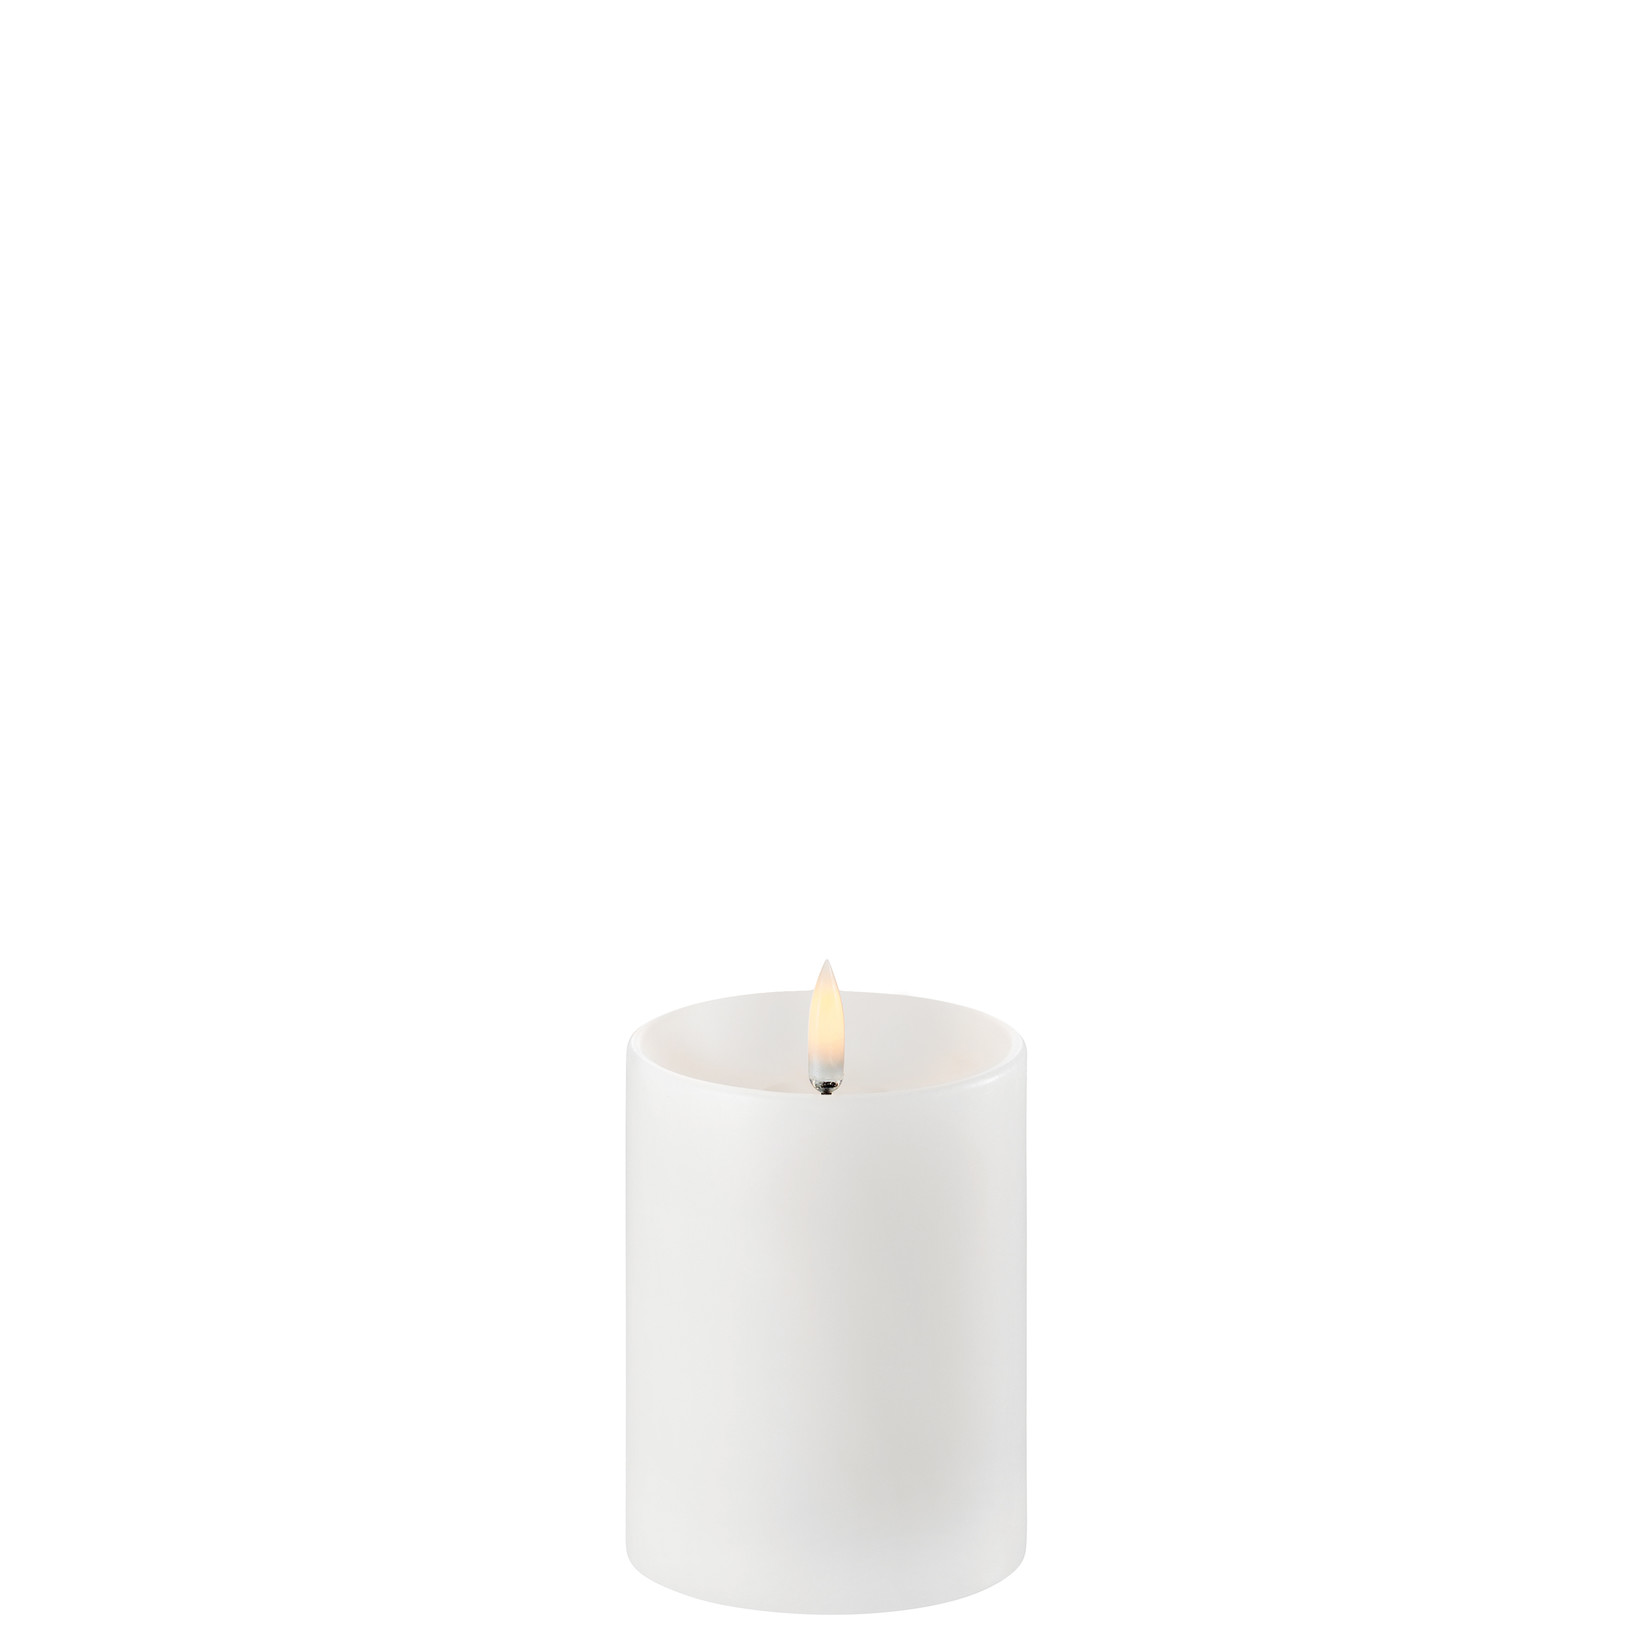 UYUNI LIGHTING LED PILLAR CANDLE - NORDIC WHITE - Ø7,8 x 10 CM - w. Shoulder